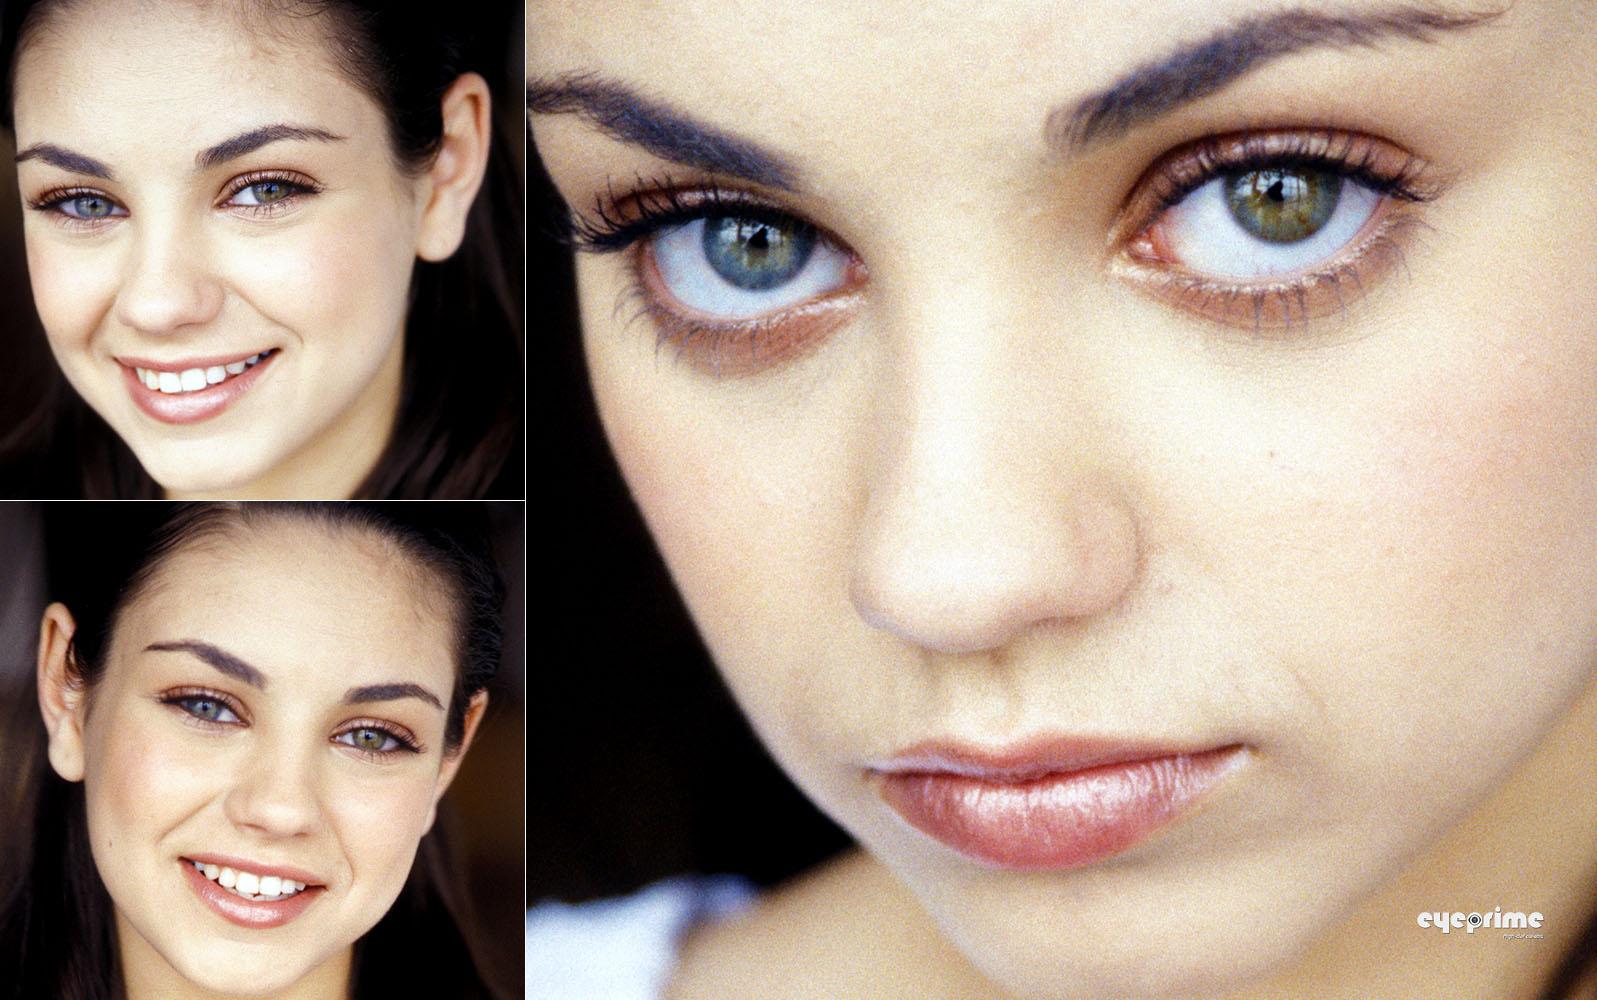 http://3.bp.blogspot.com/_cnya8urXwzU/TFRZV5Y5WkI/AAAAAAAAKco/XkJV3mcM4Ps/s1600/mila_eyeprime_31.jpg